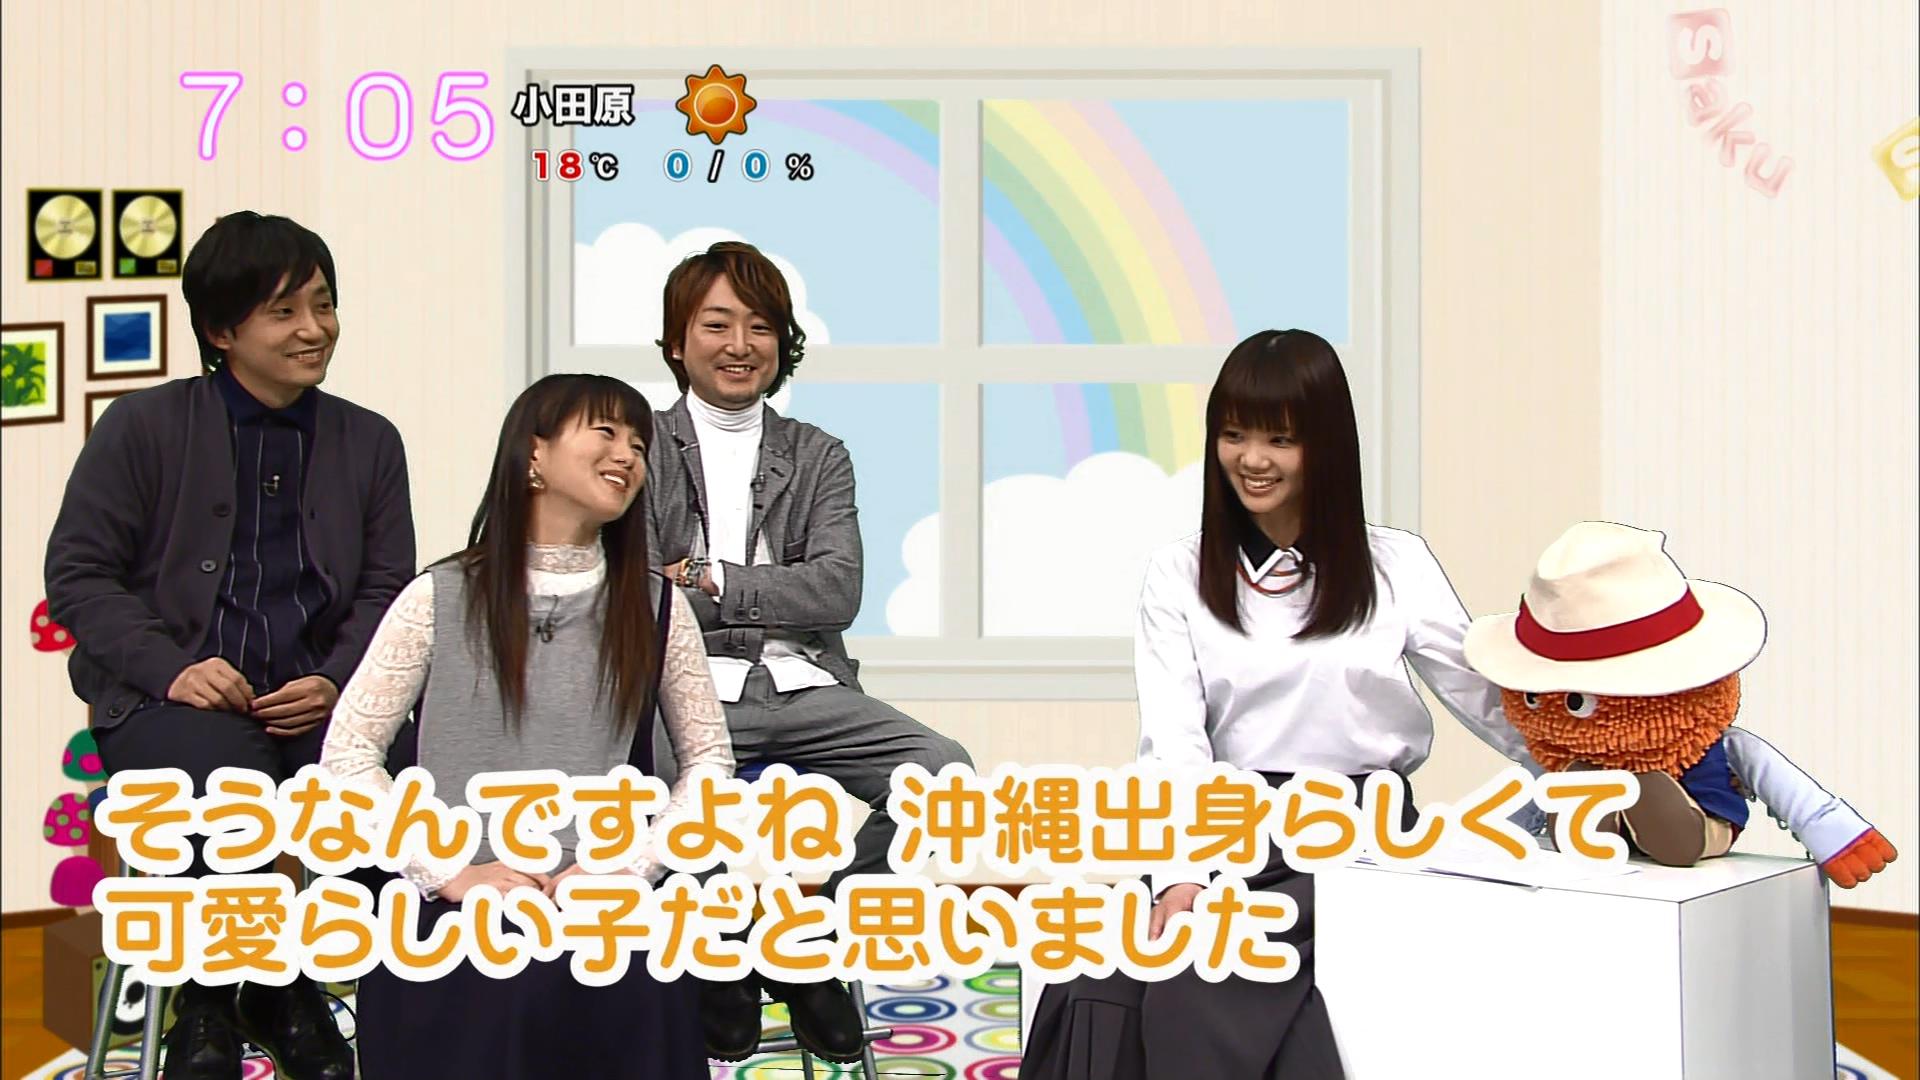 2016.03.17 いきものがかり(saku saku).ts_20160317_075439.005